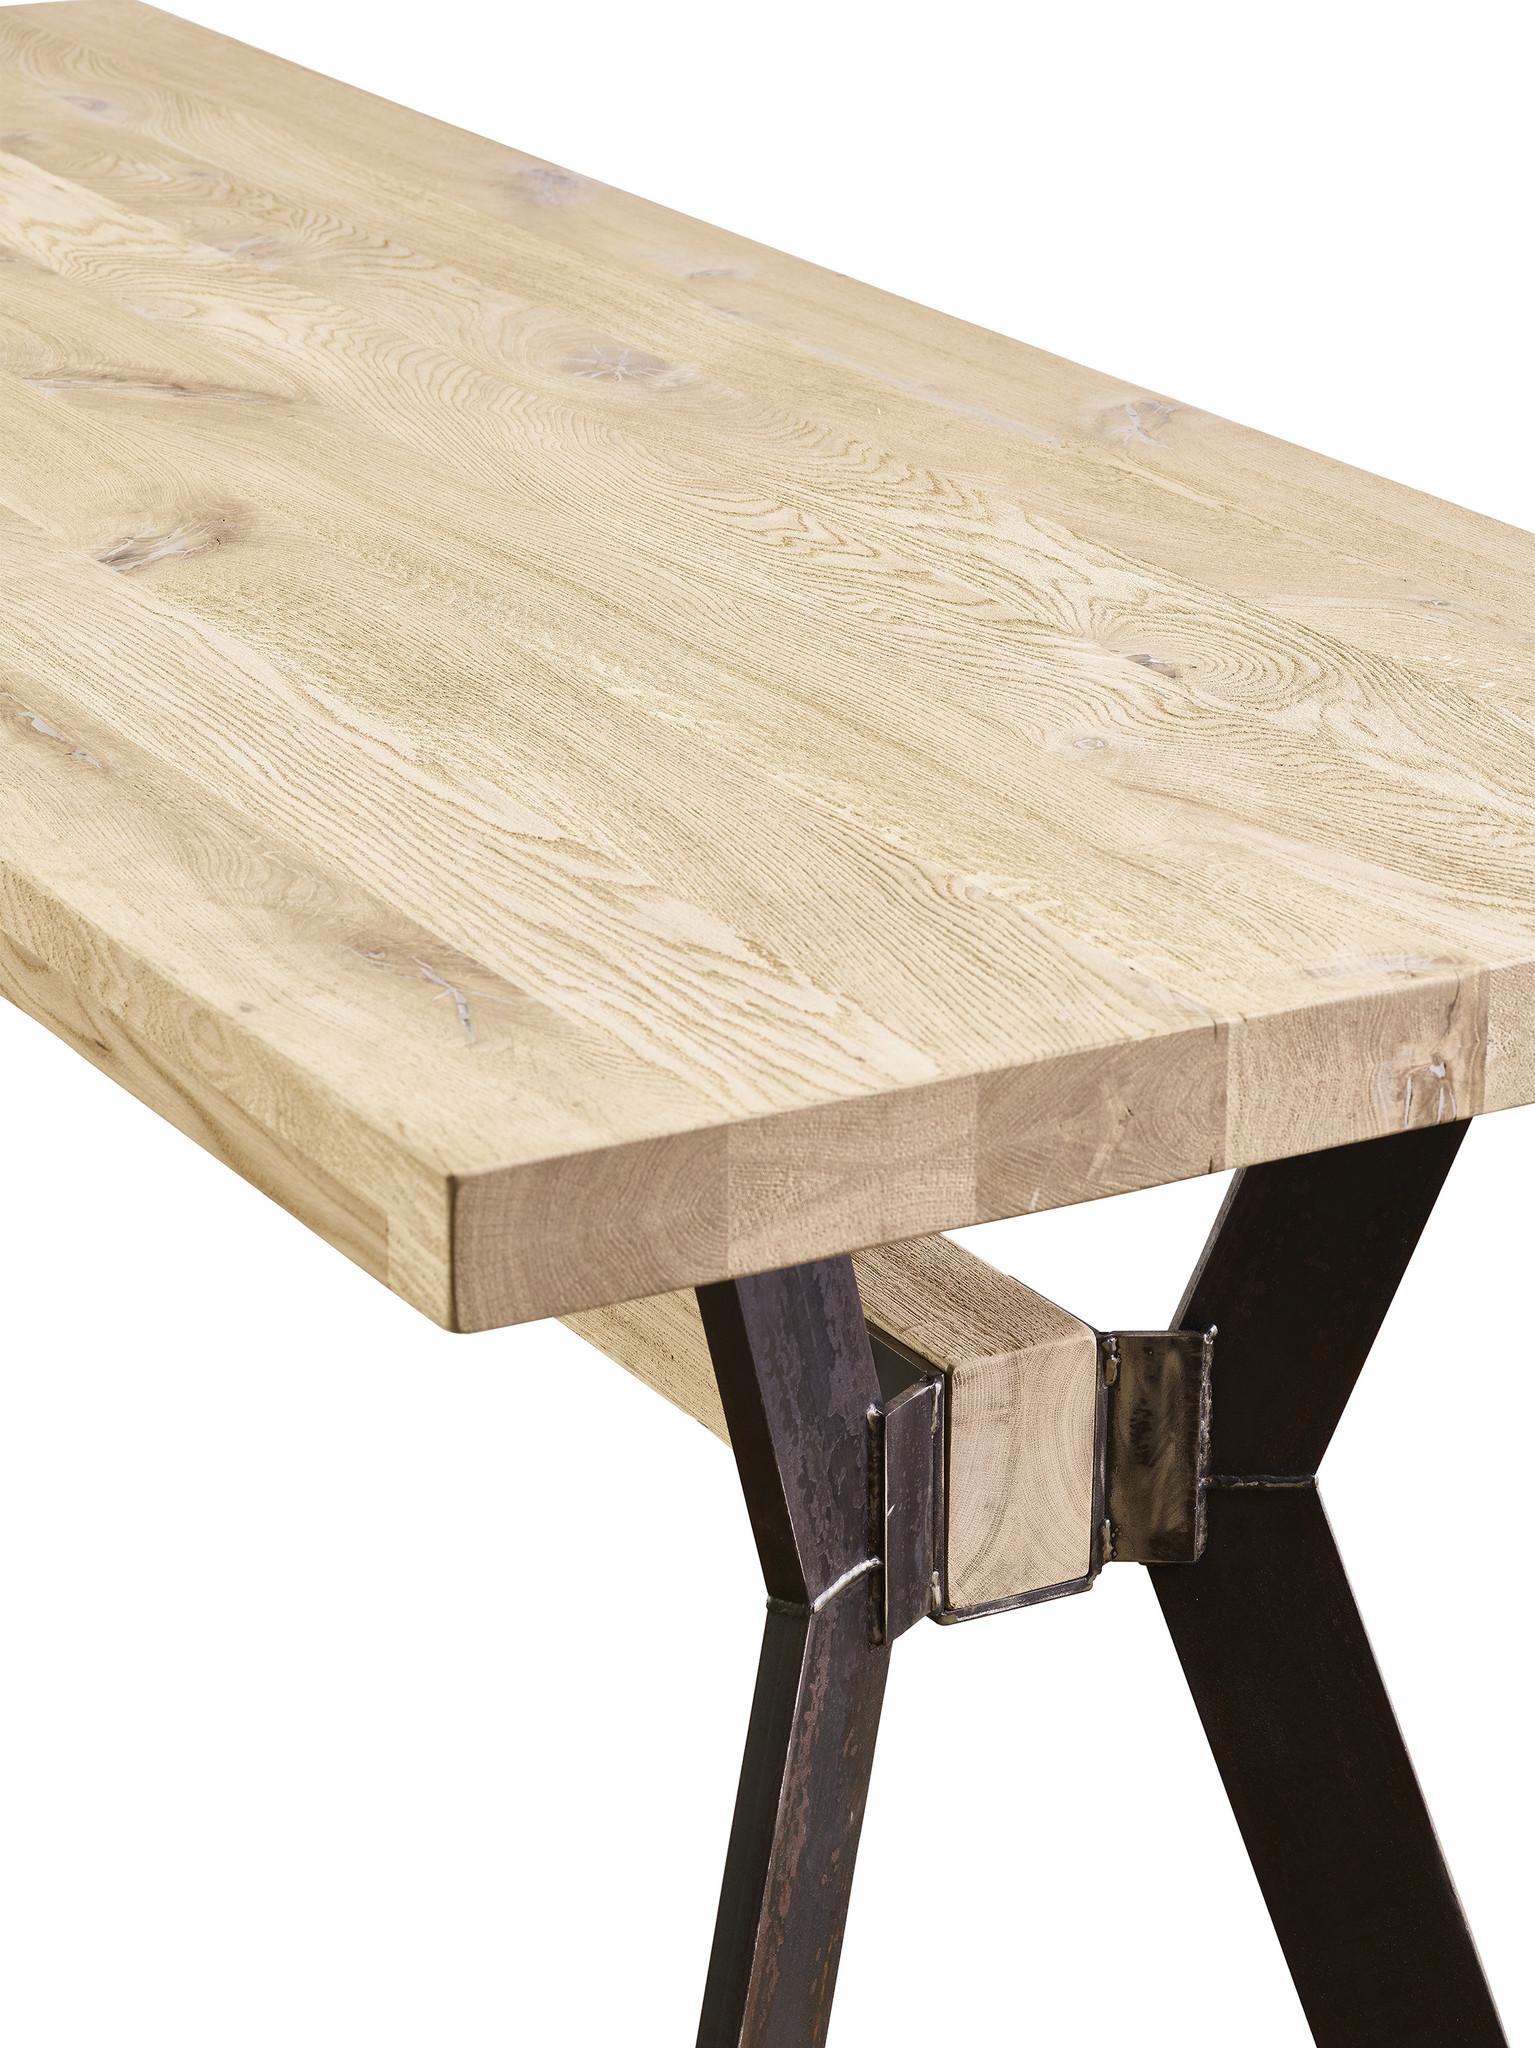 Tafel Eiken tafel - Praag